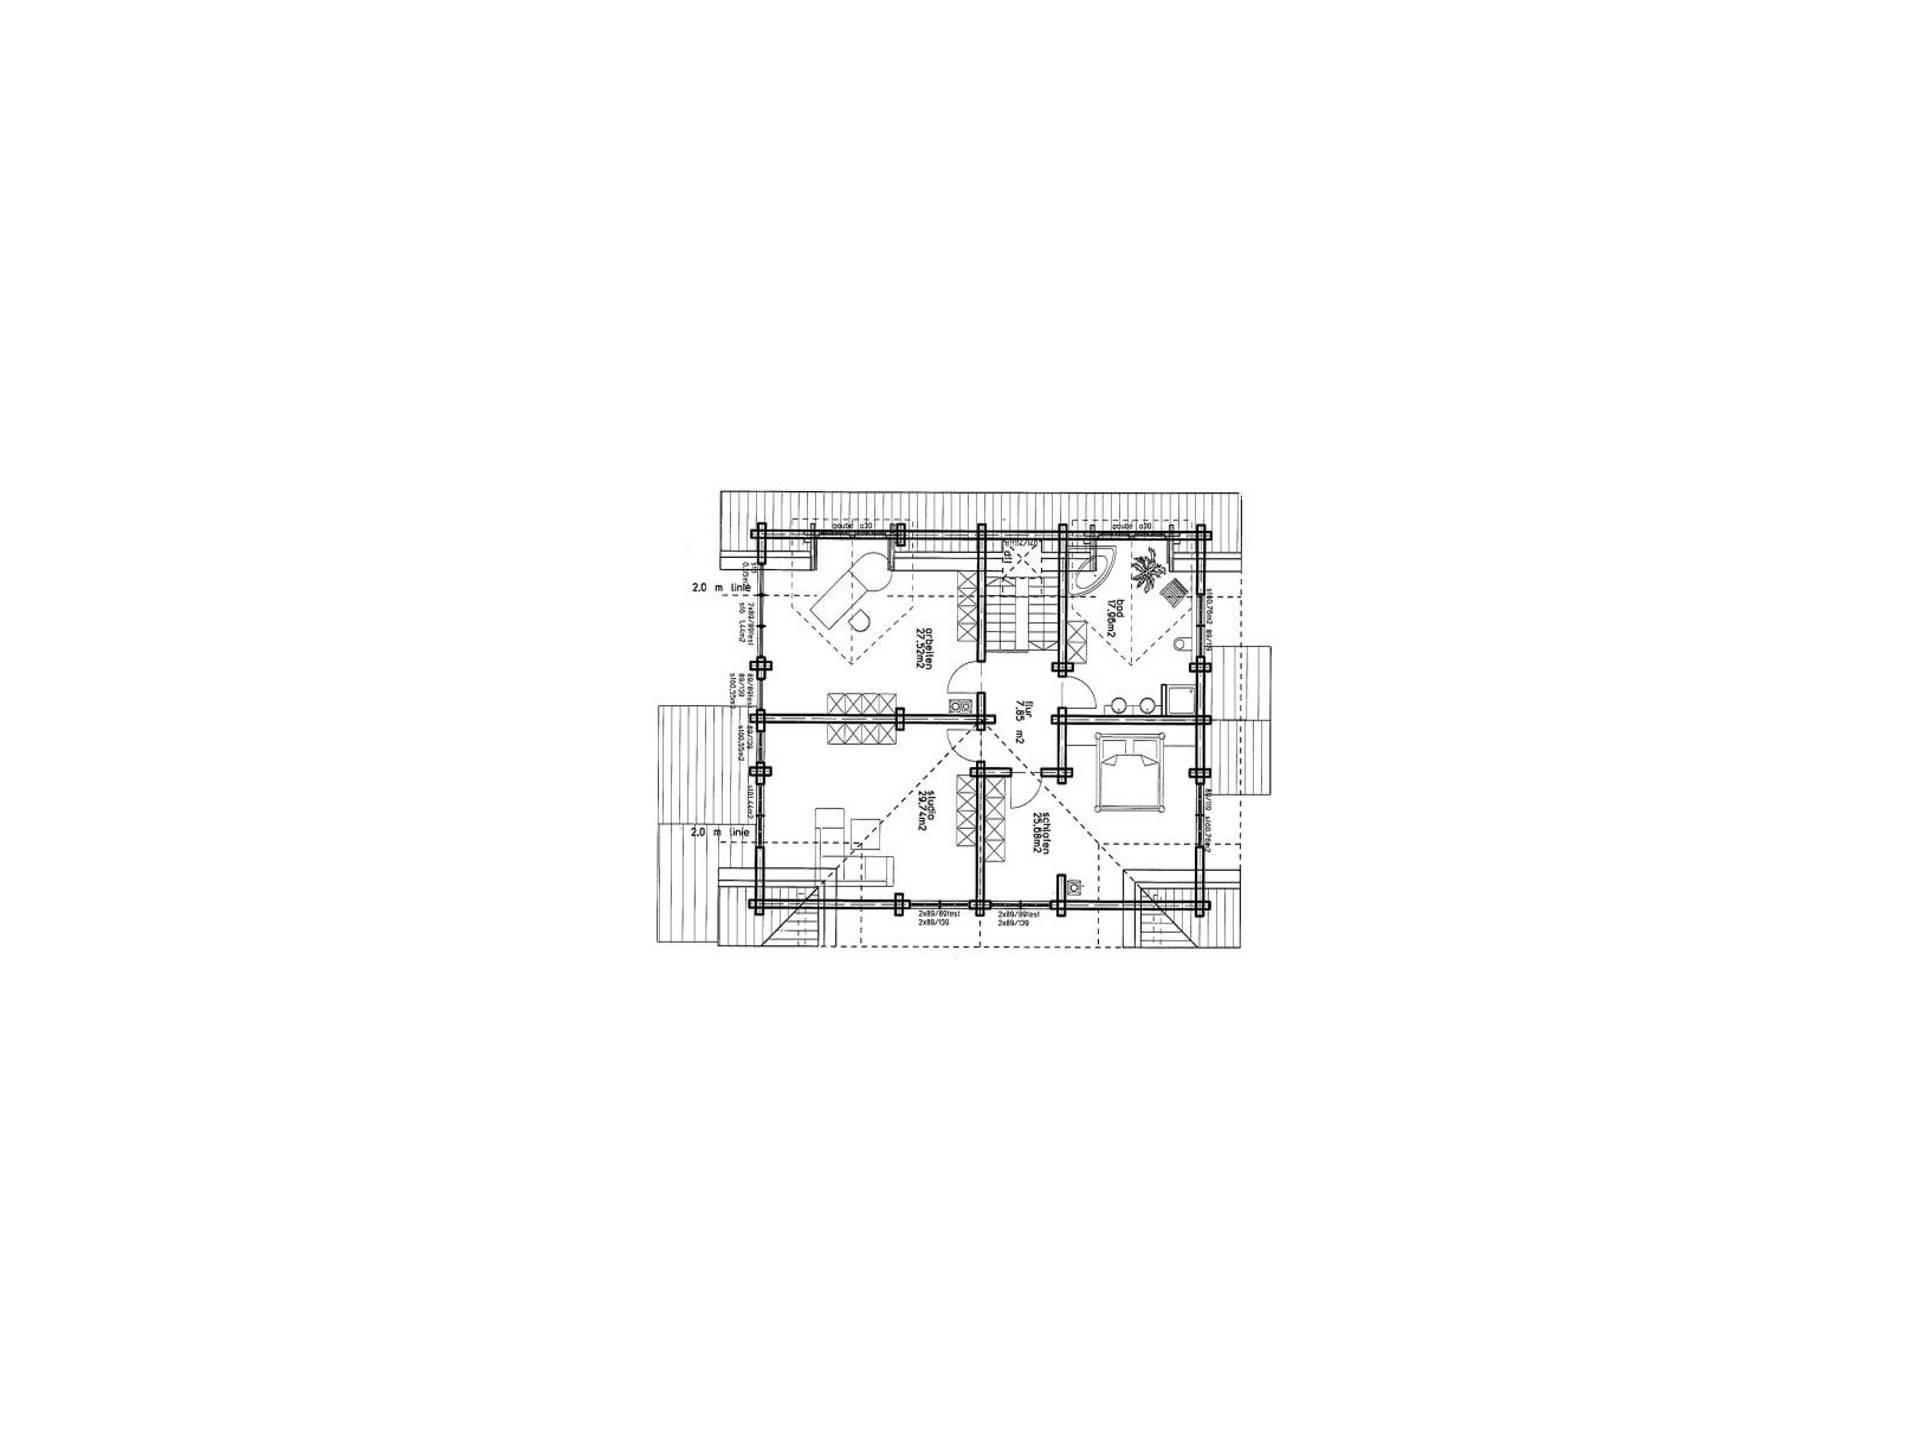 Haus Rheinland von Honka Blockhaus, Grundriss Dachgeschoss